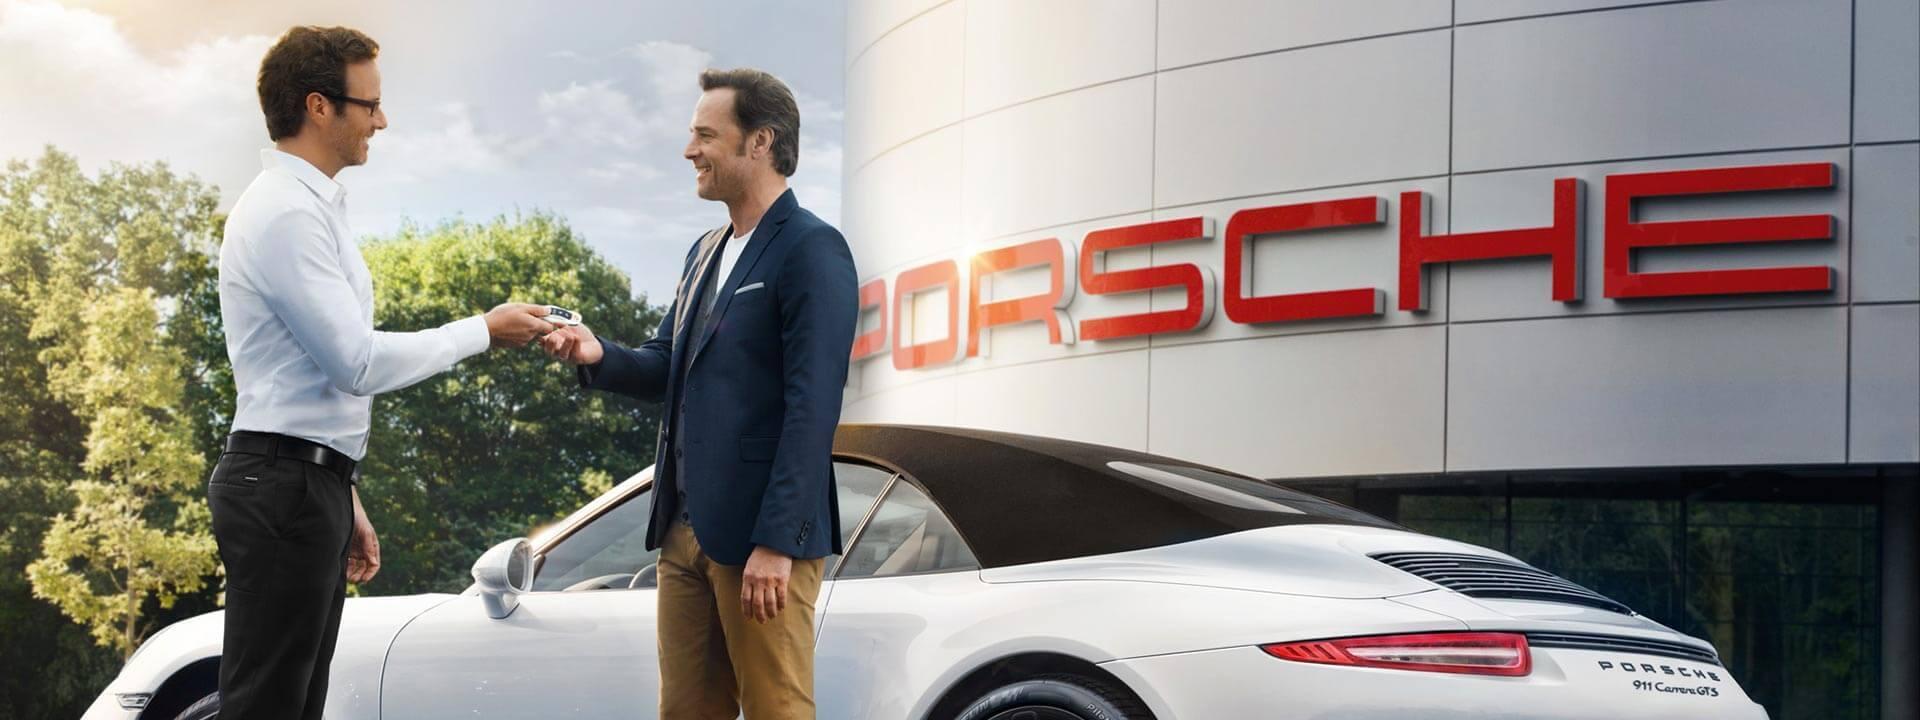 Two men exchanging Porsche keys in Kansas City